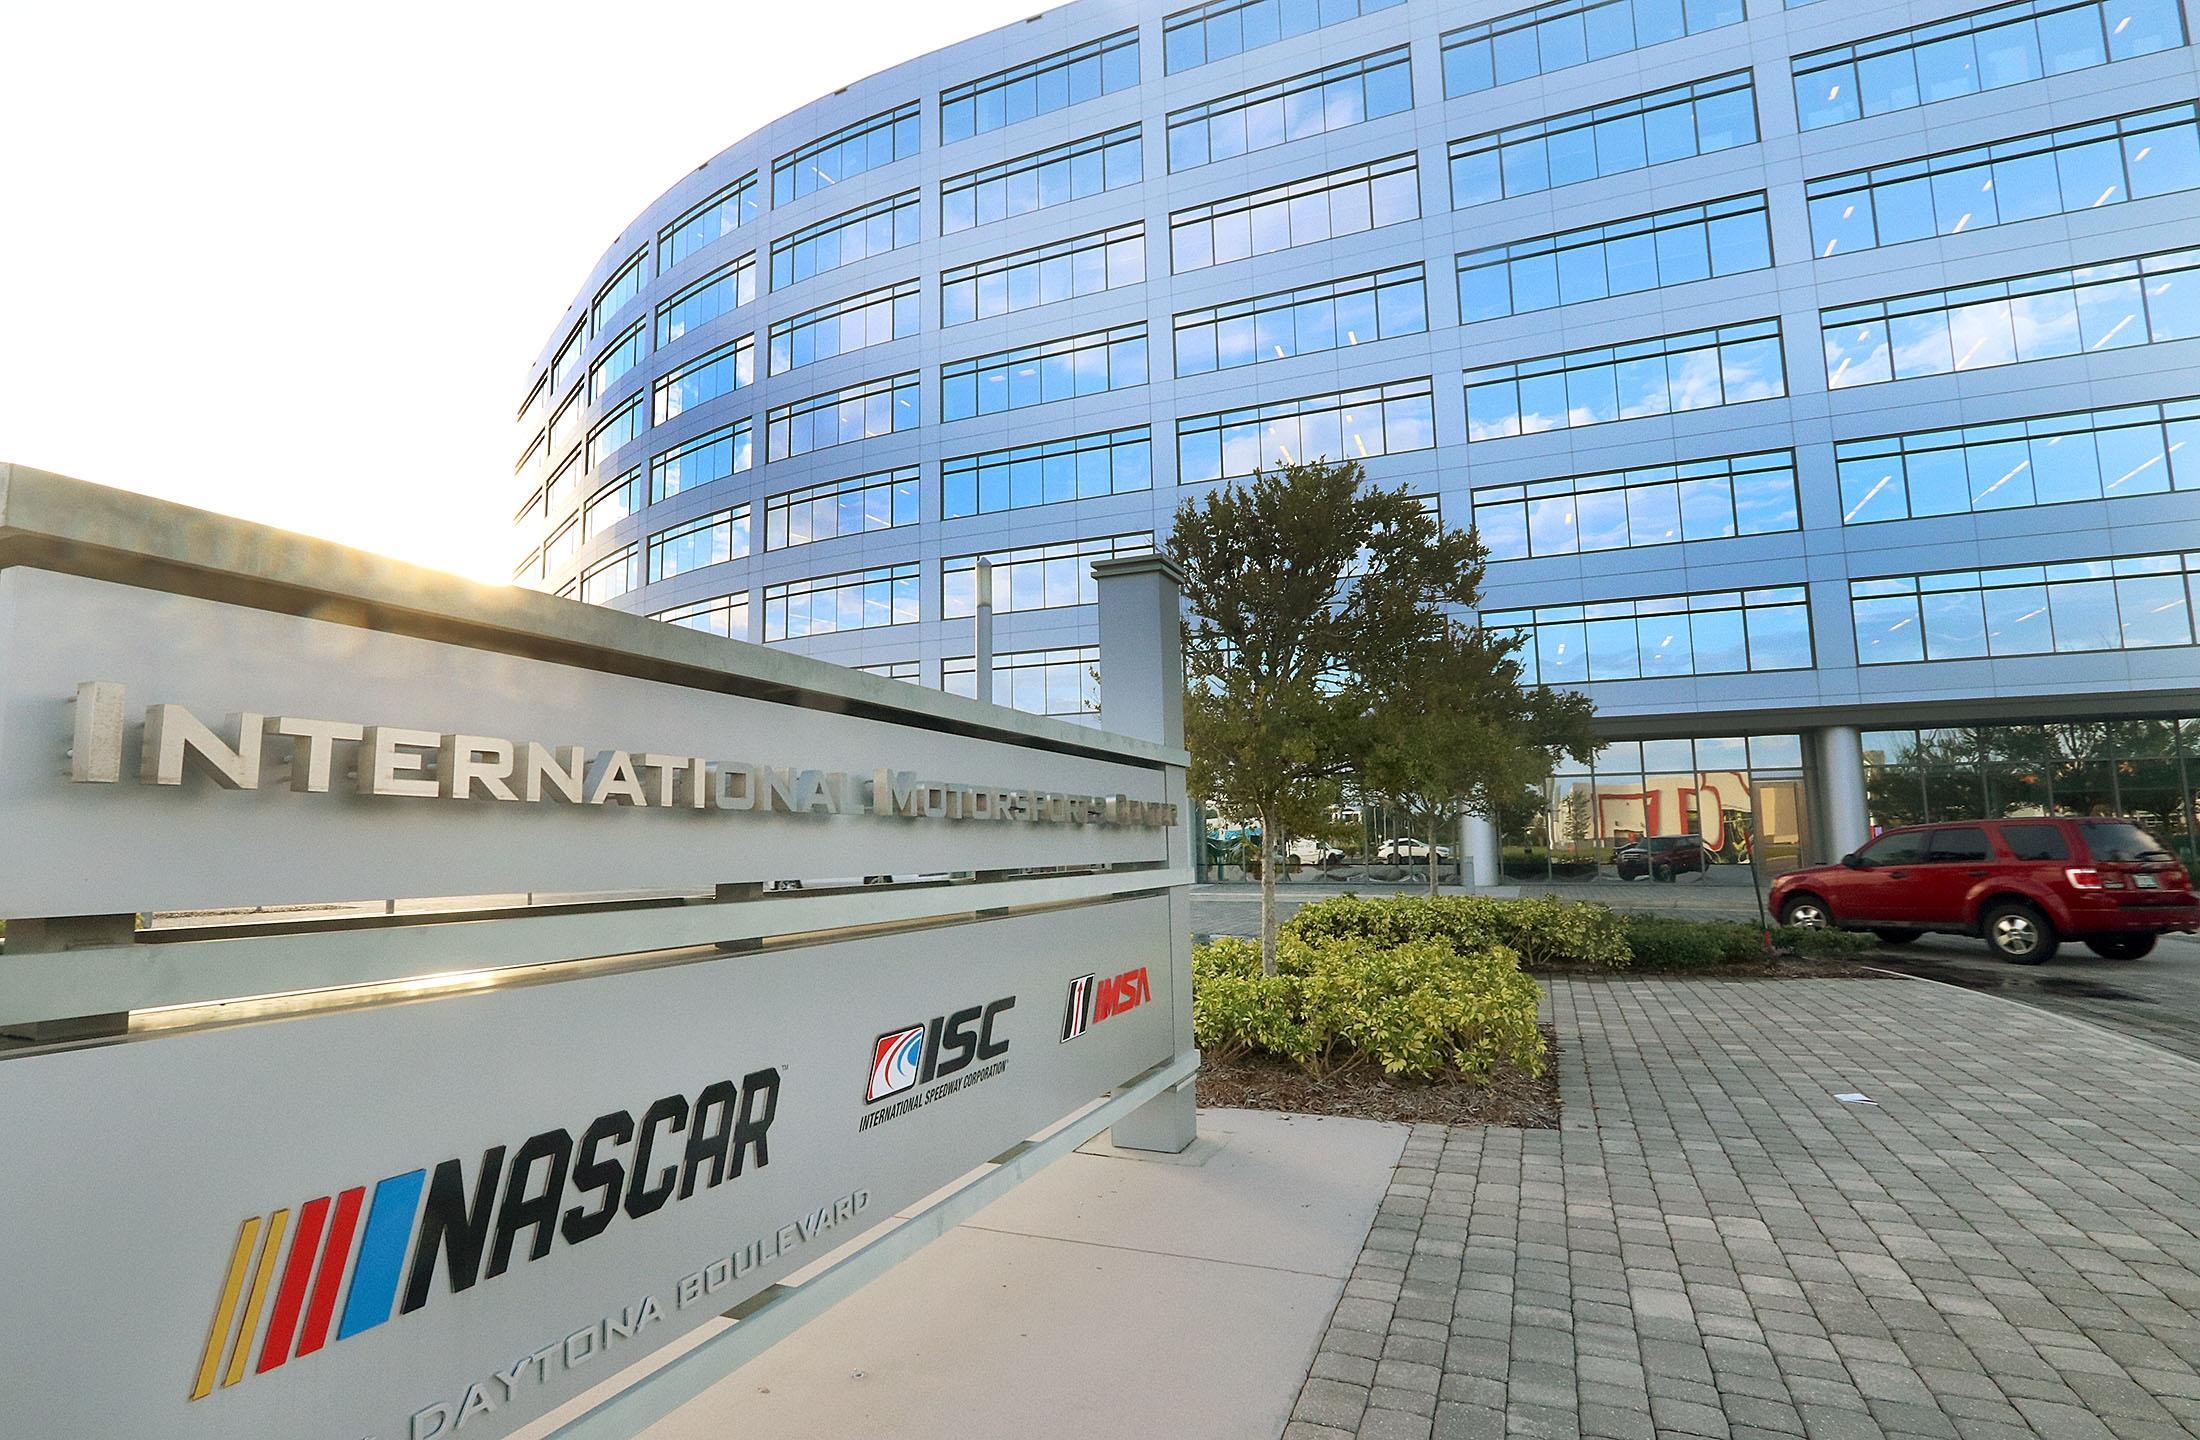 NASCAR, ISC merger: What it means – Daytona Beach News-Journal